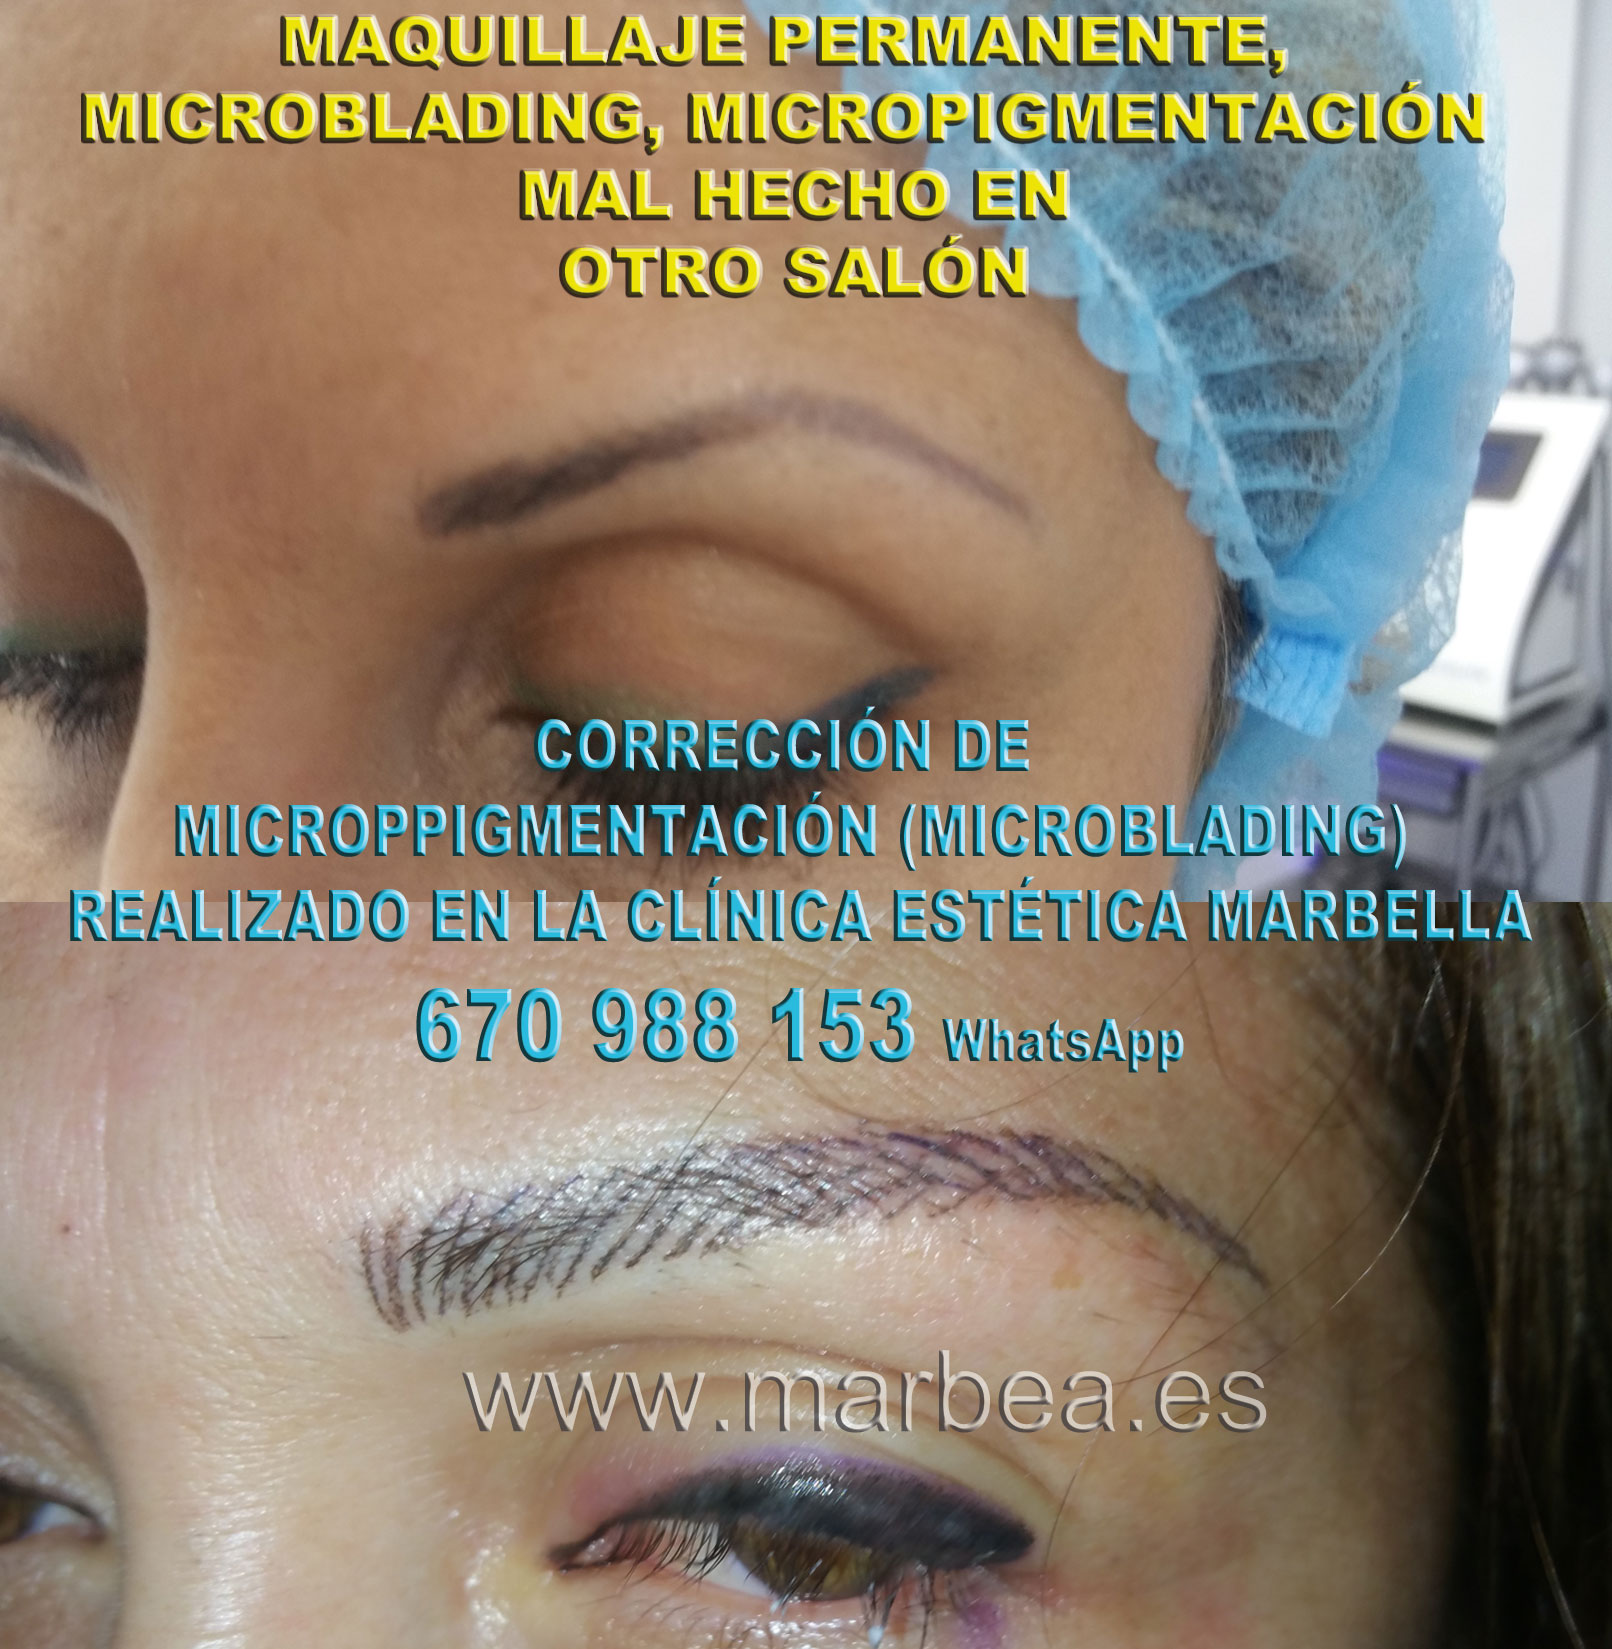 ELIMINAR TATUAJE CEJAS clínica estética maquillaje permanete entrega micropigmentacion correctiva de cejas,reparamos microppigmentacion mal hechos